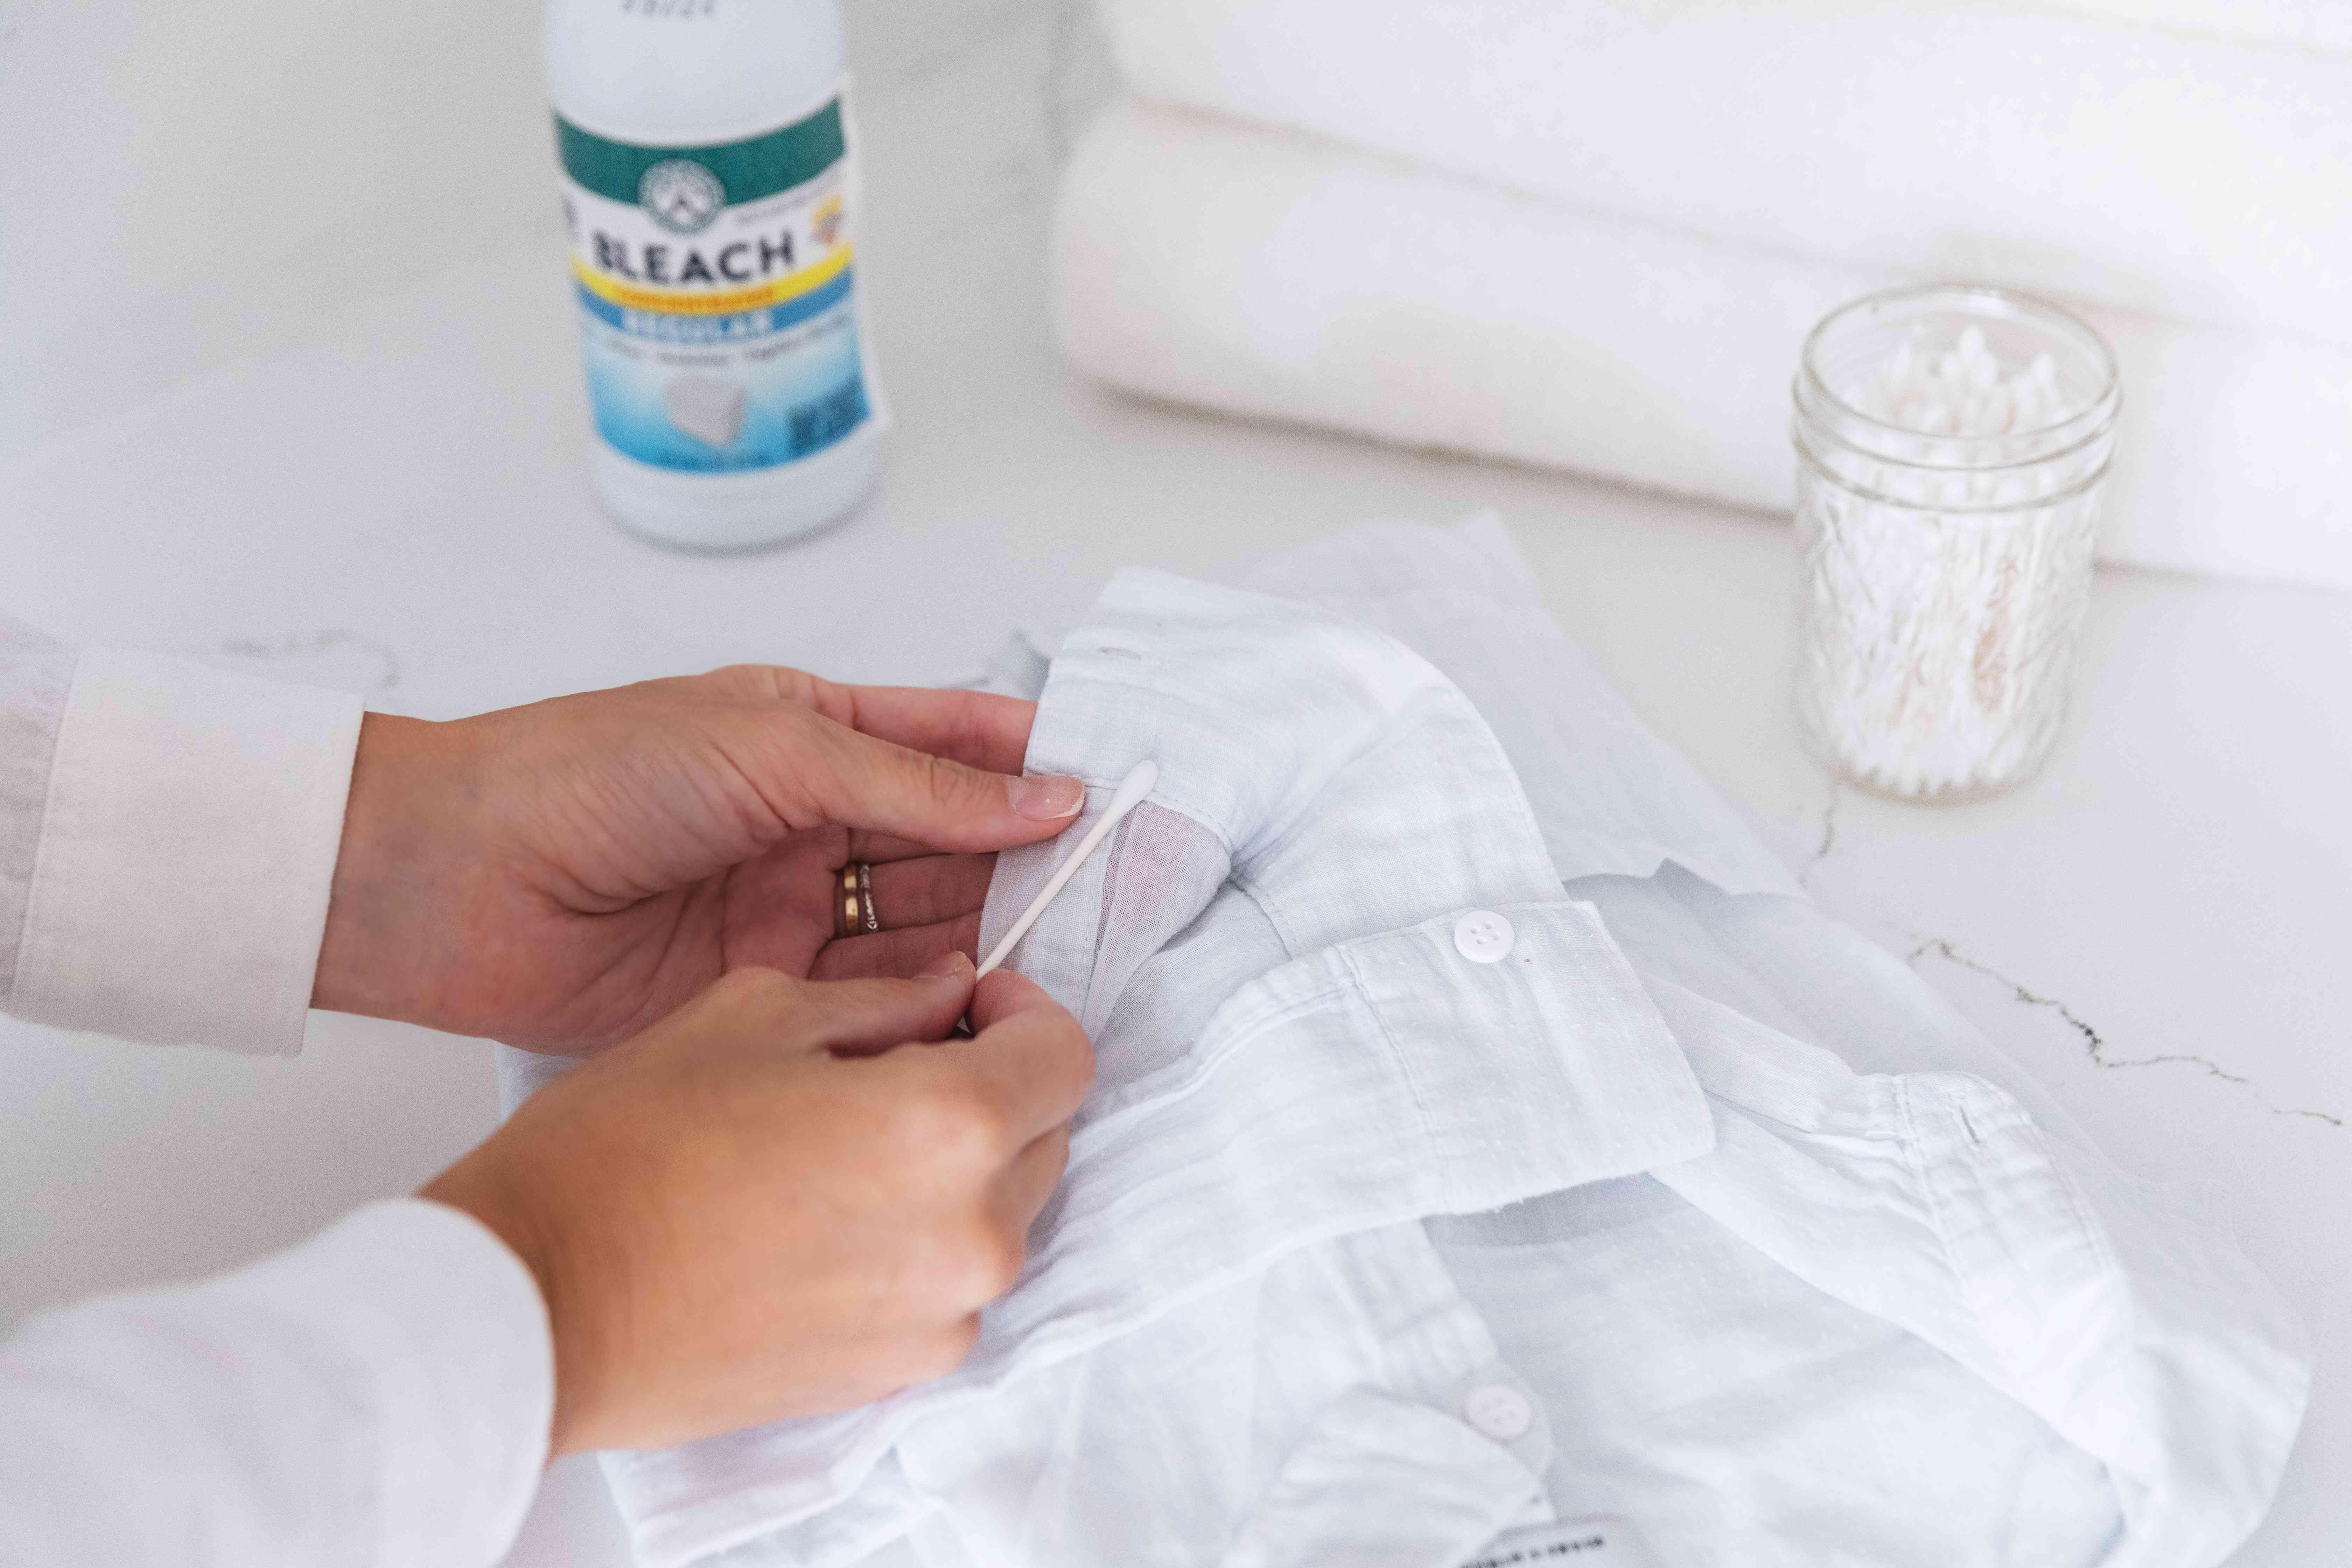 testing bleach on fabric